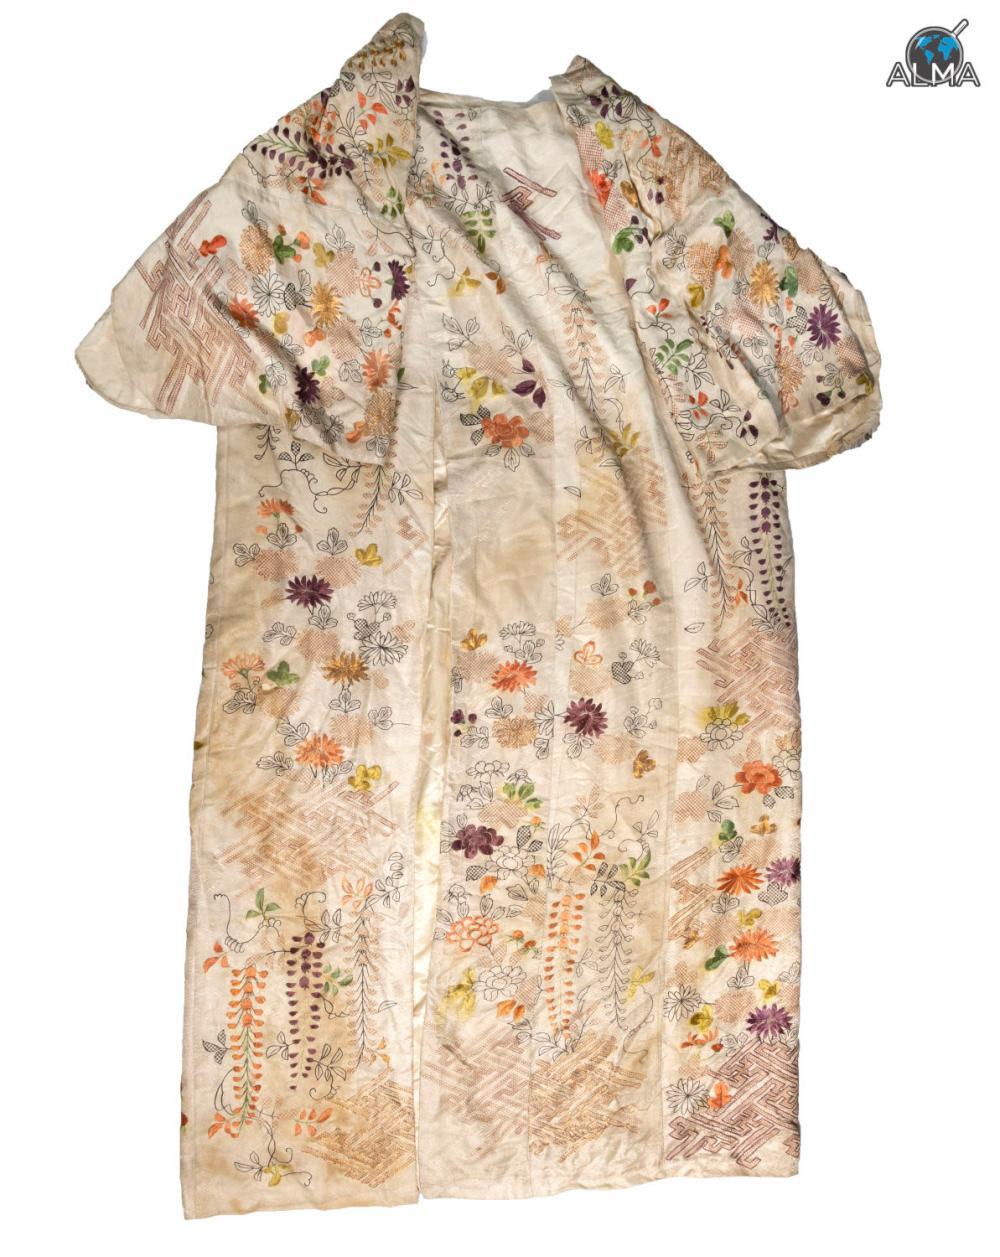 Hand Embroidereג custom made kimono Japan 19th c